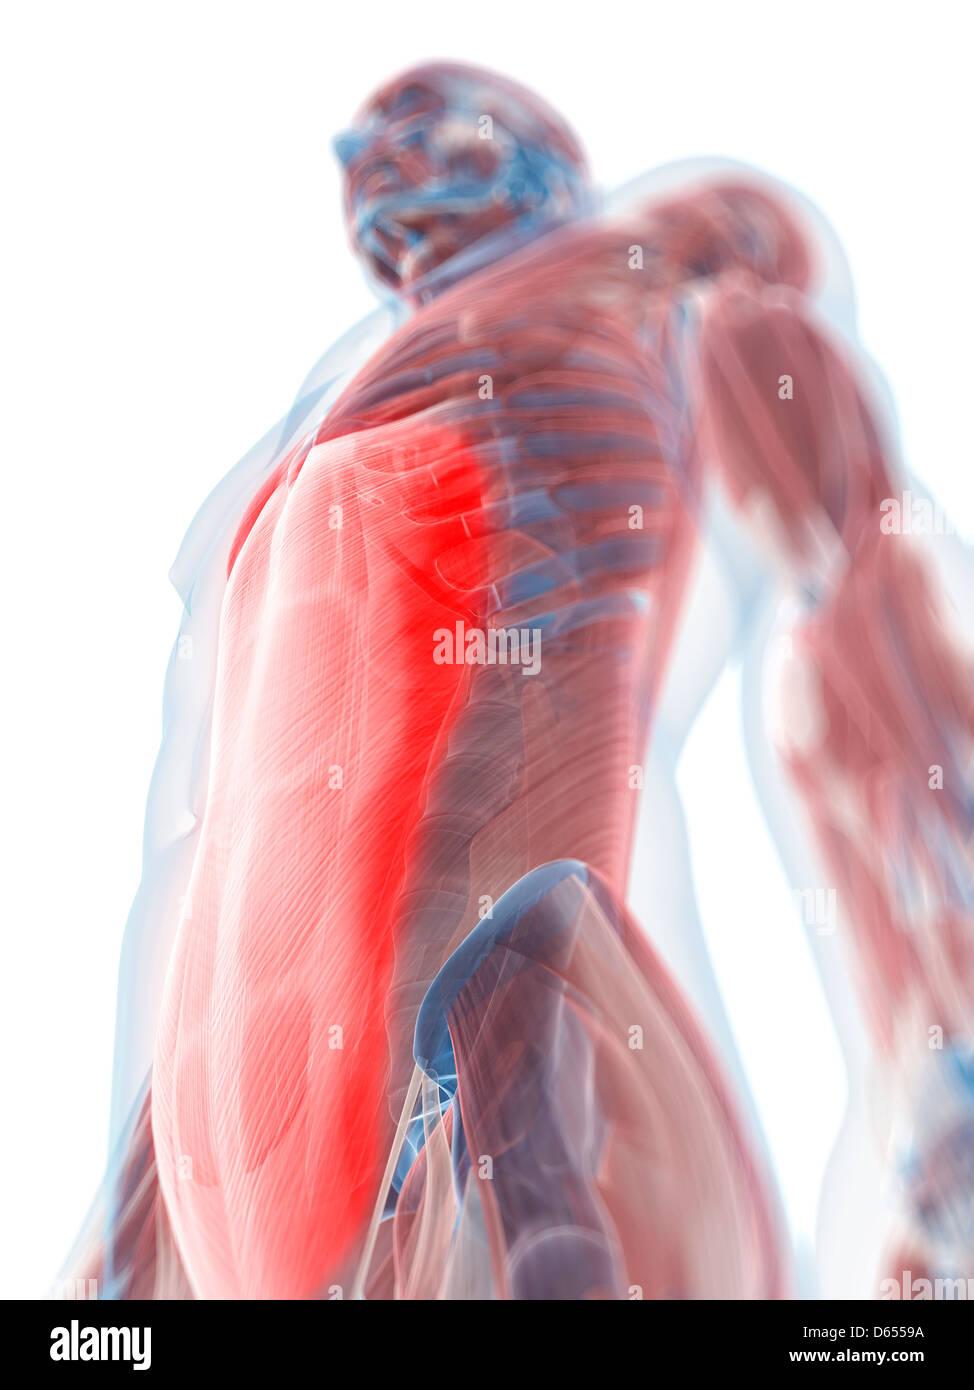 Rectus Abdominis Muscle Imágenes De Stock & Rectus Abdominis Muscle ...